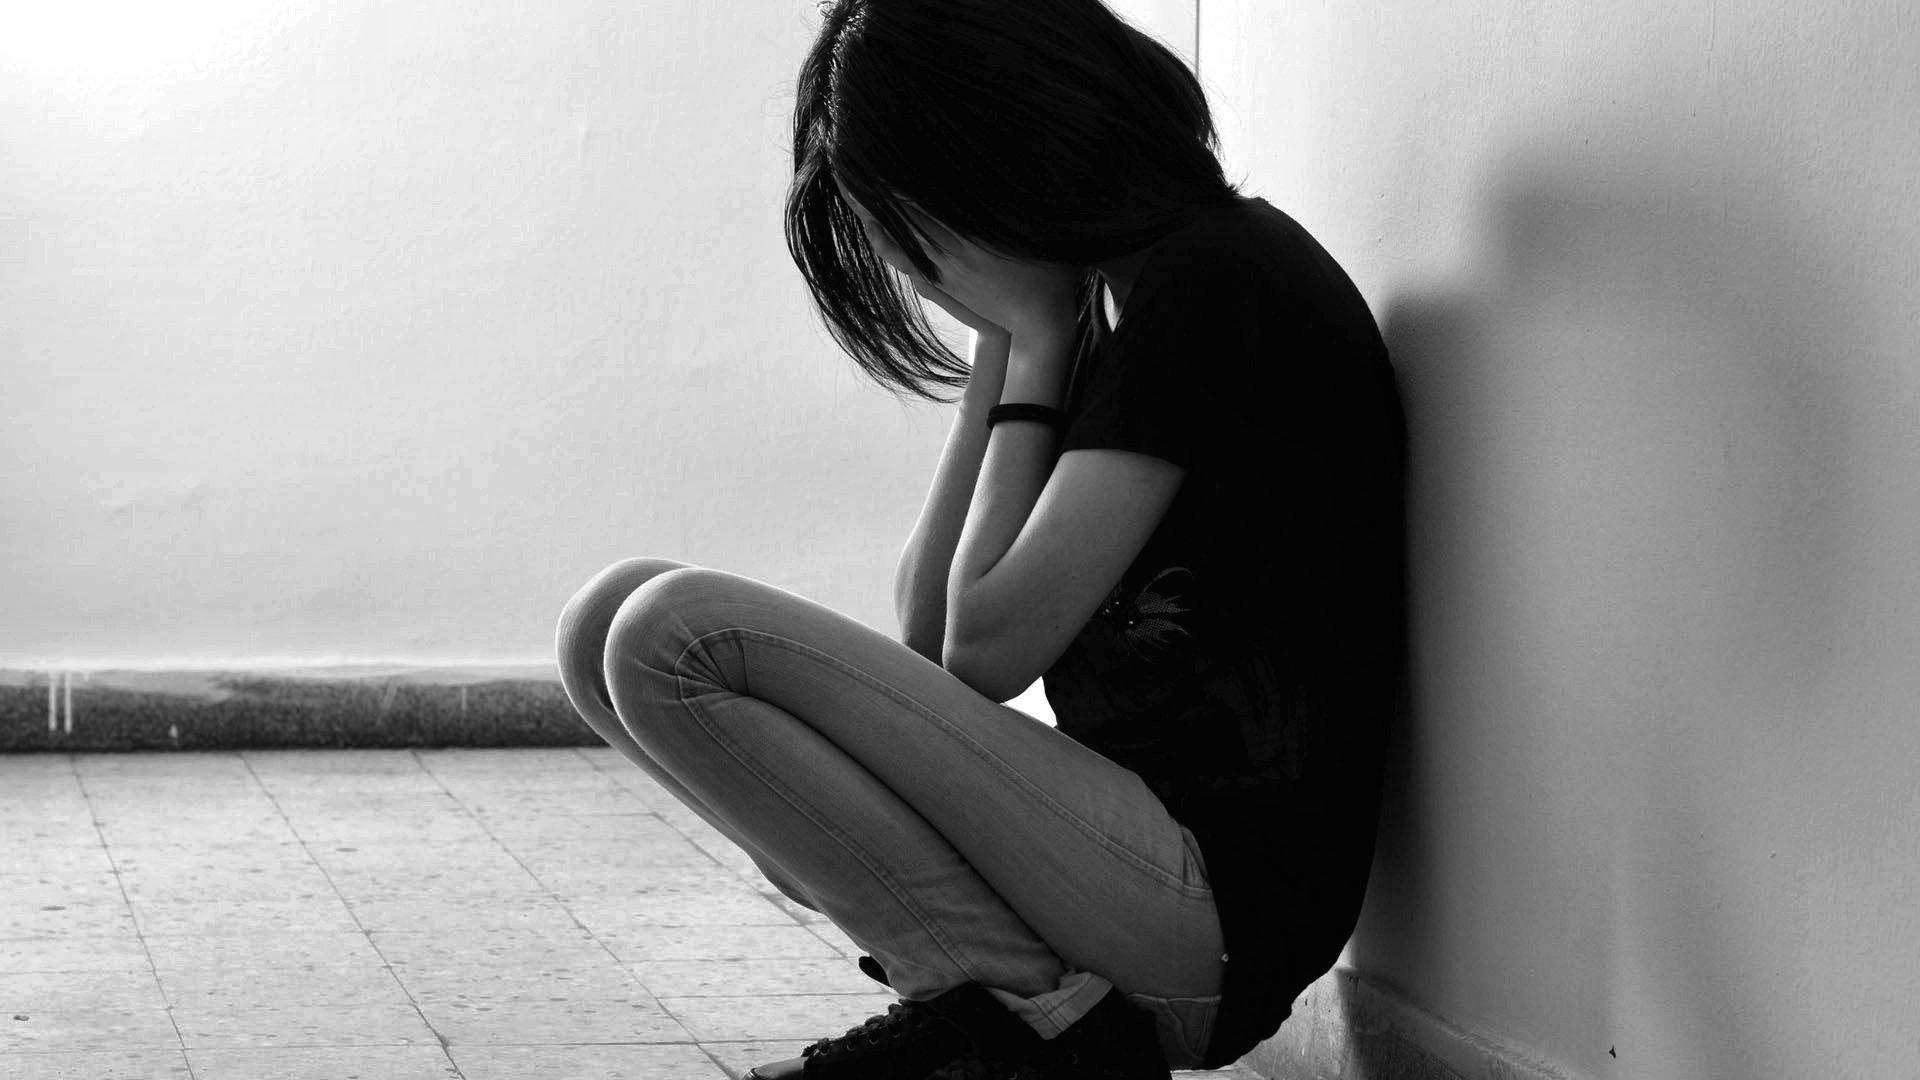 7. Lack of proper sleep causes depression.